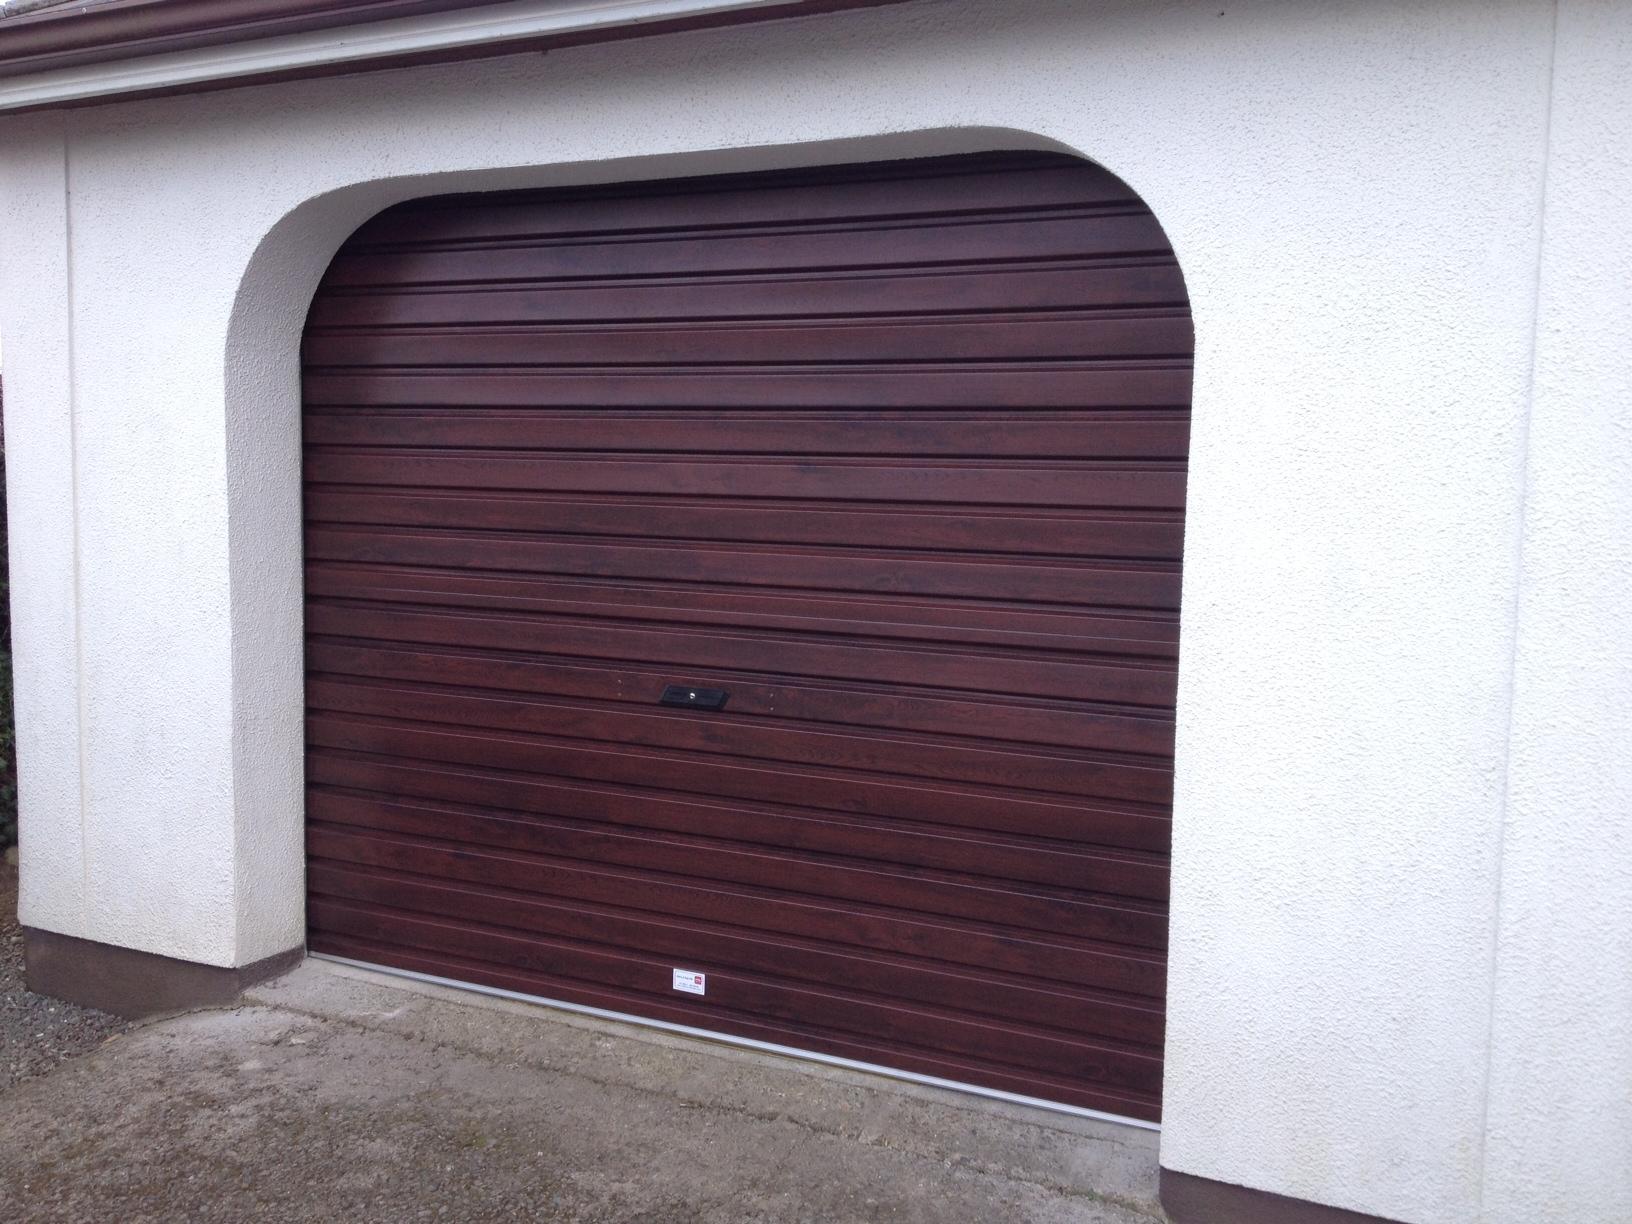 service size repair tx henderson near overhead doors gds of openers antonio garage houston full san door services me